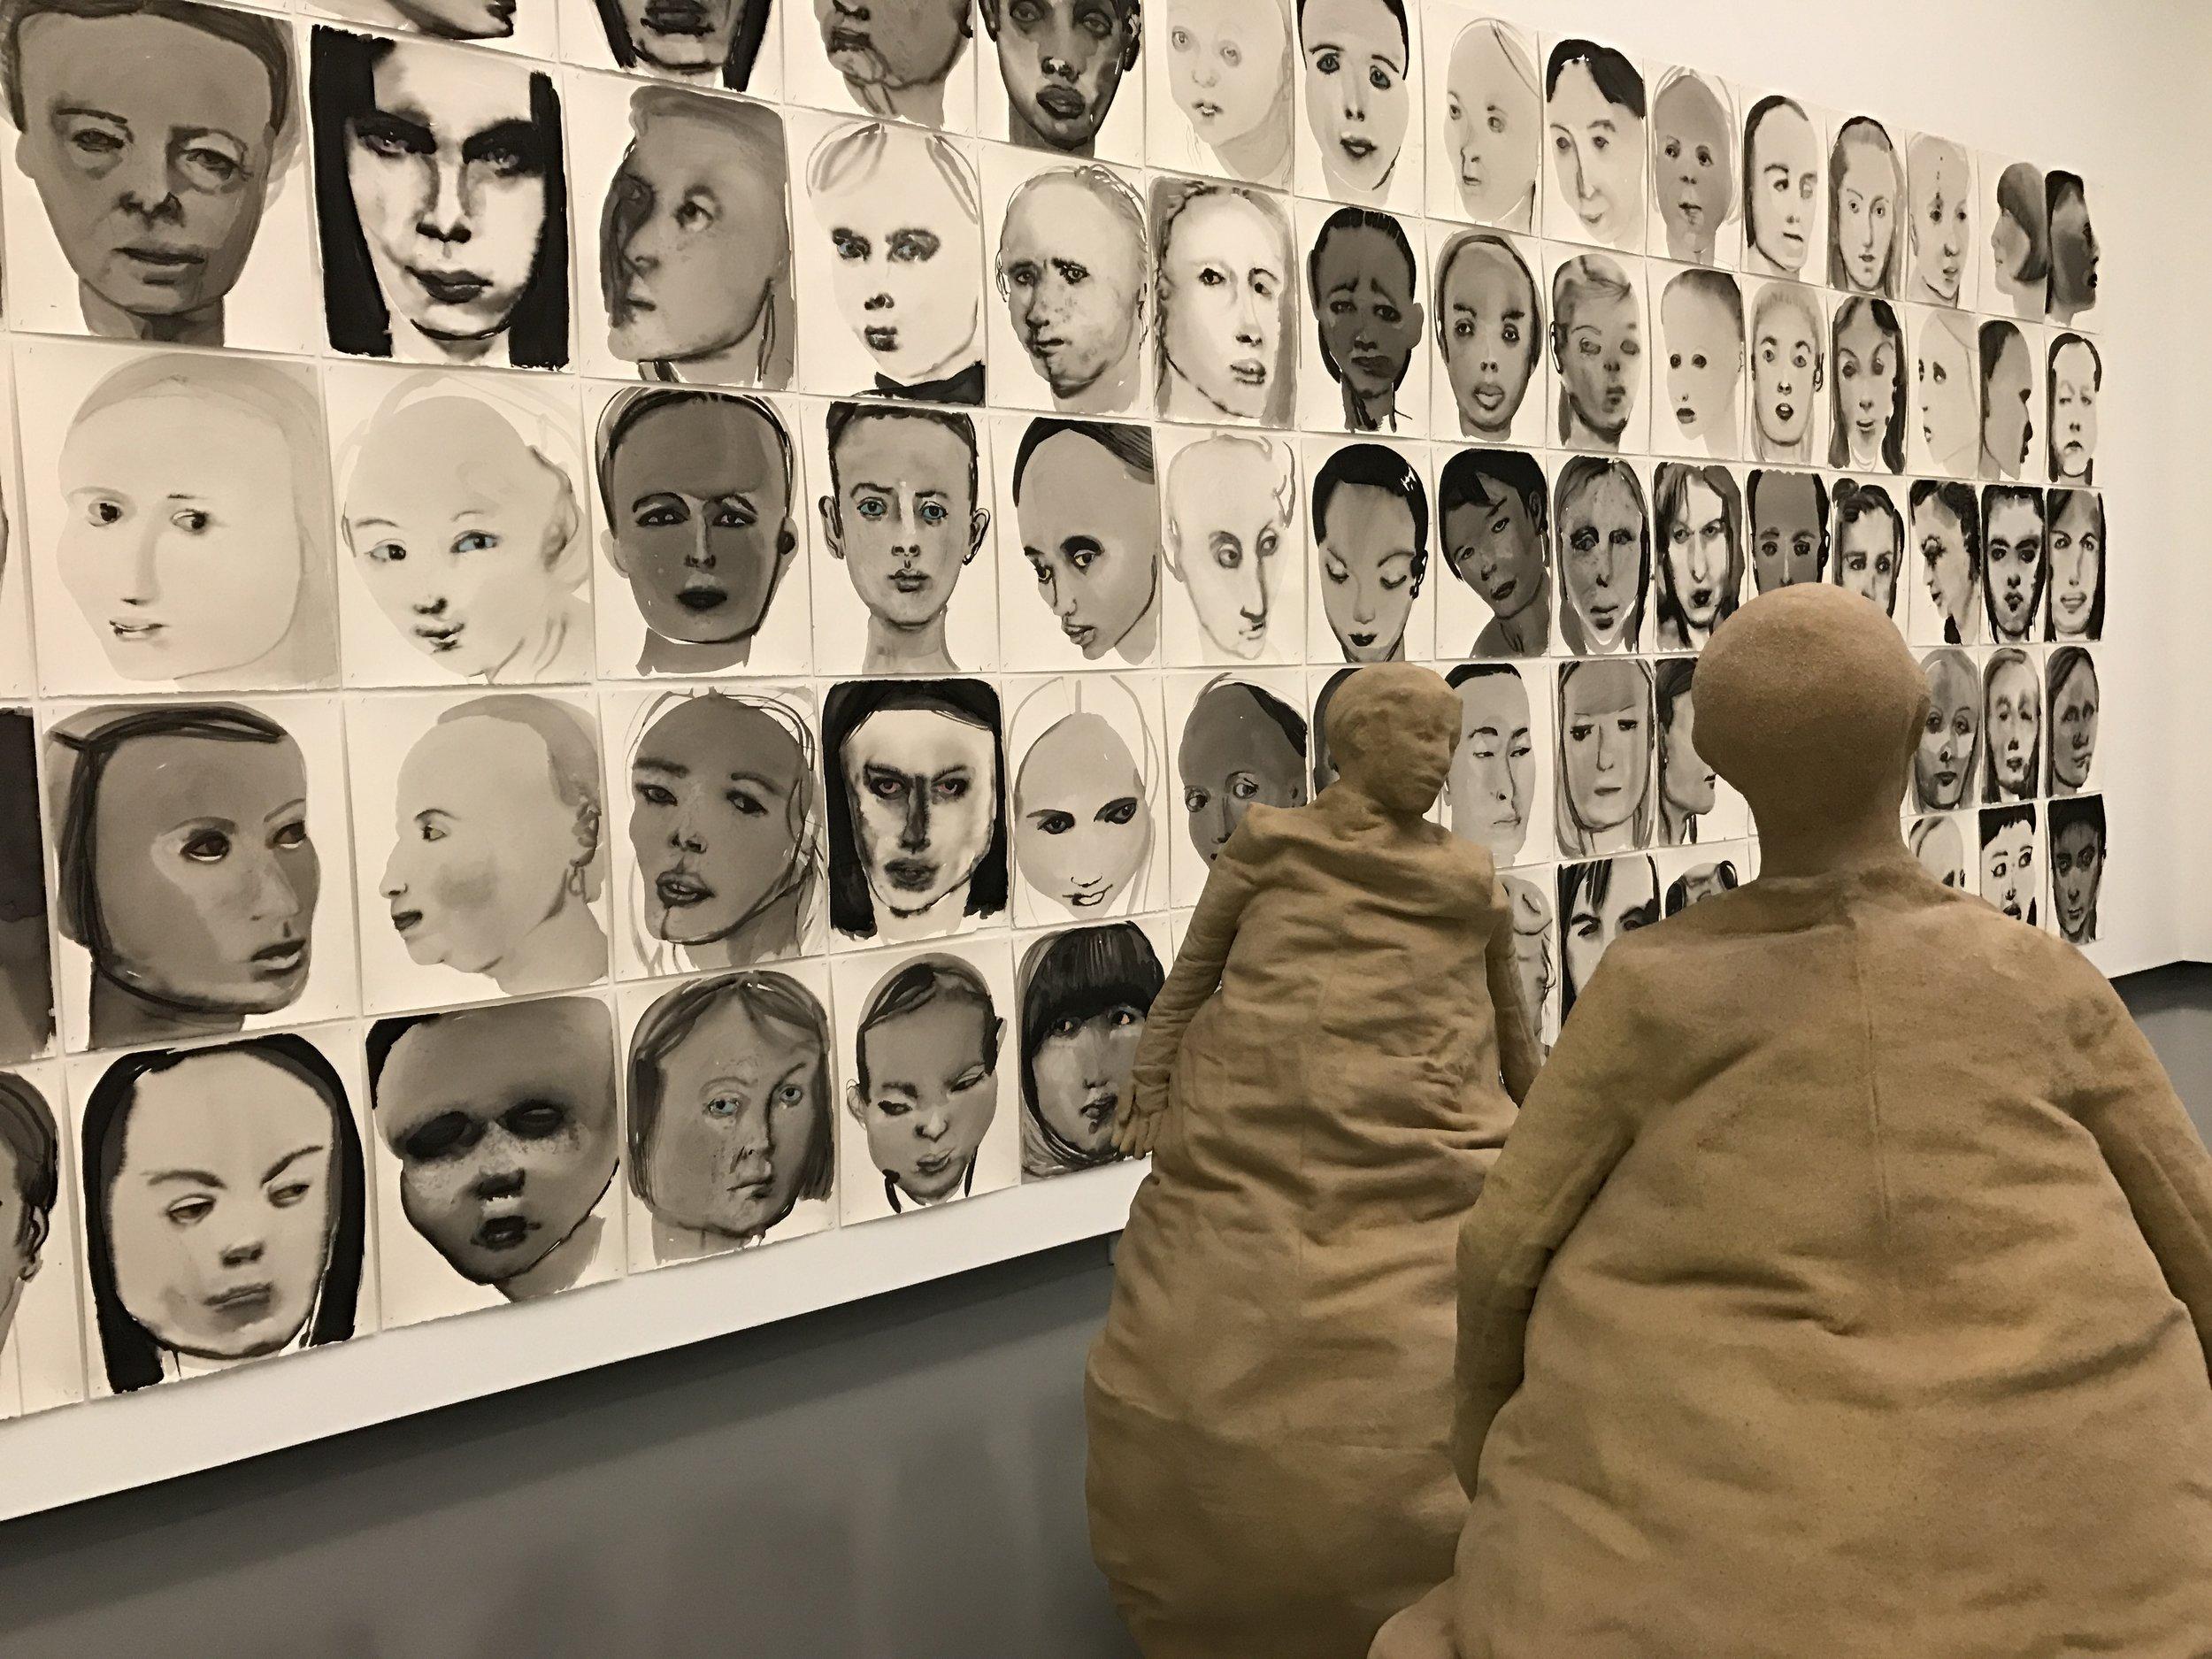 Van Abbemuseum, De Museumpodcast